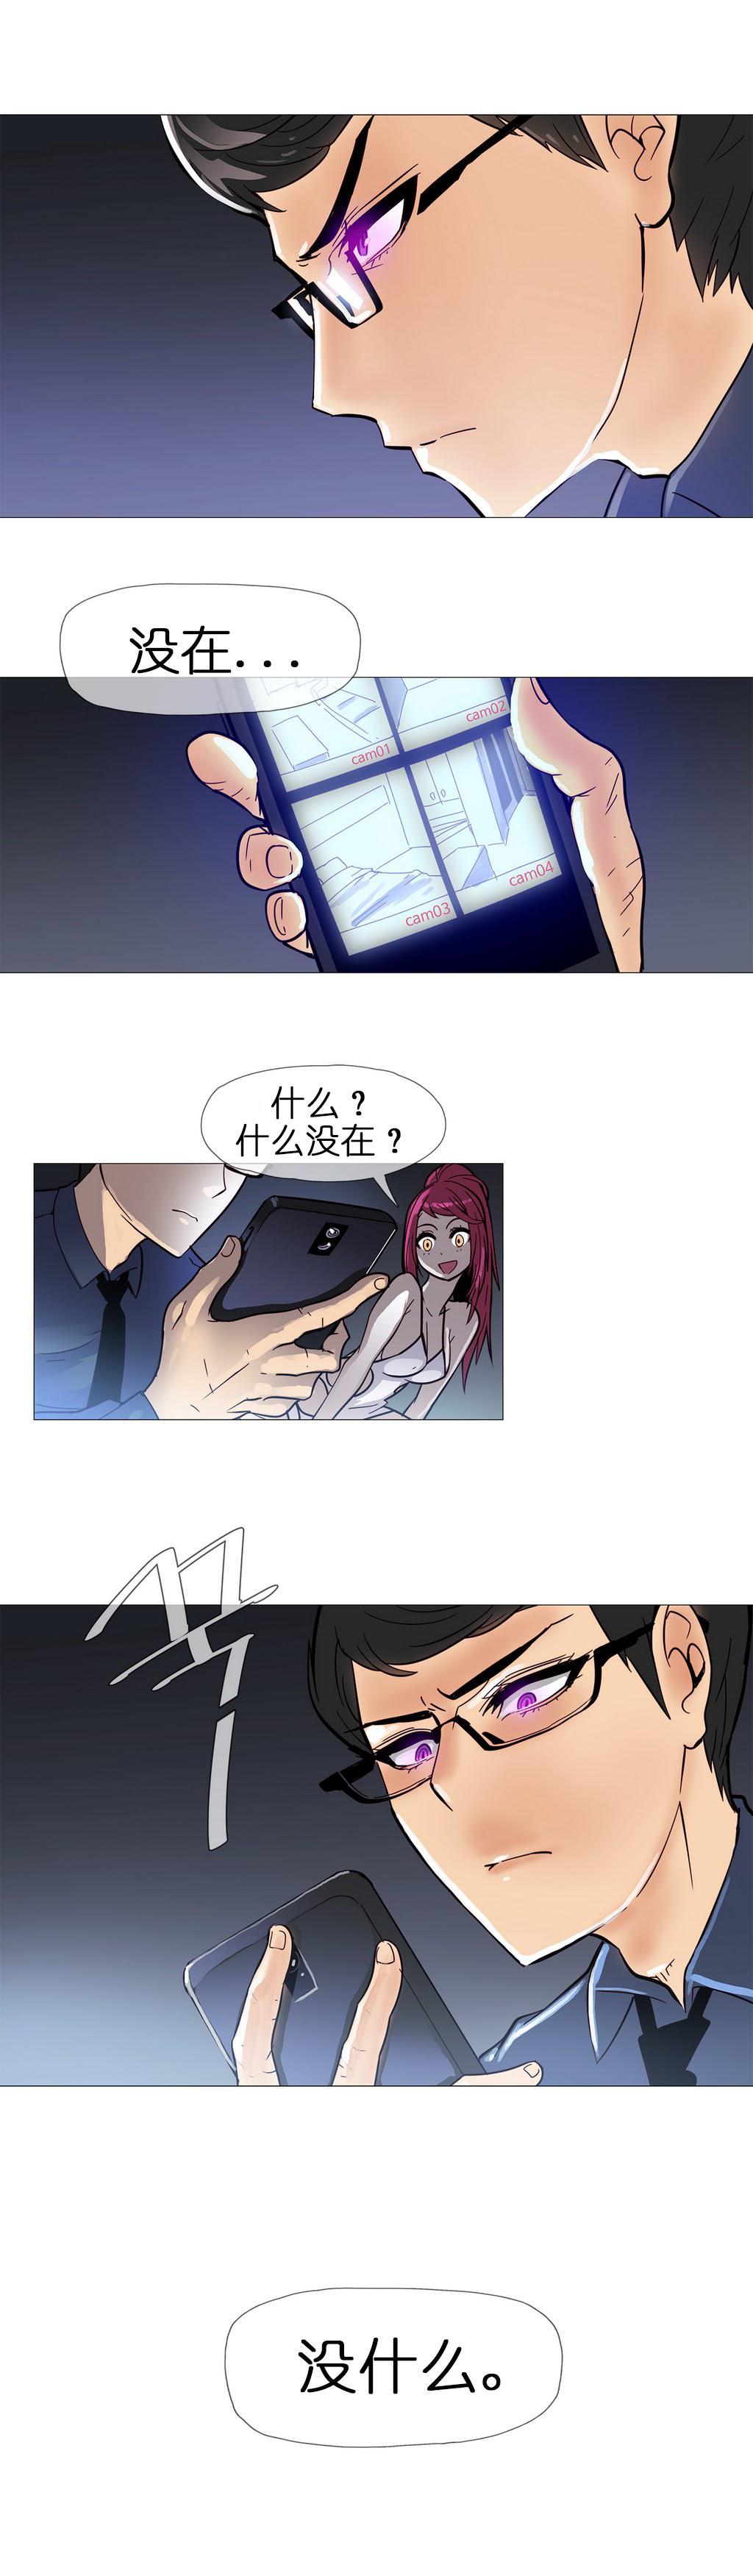 HouseHold Affairs 【卞赤鲤个人汉化】1~21话(持续更新中) 182